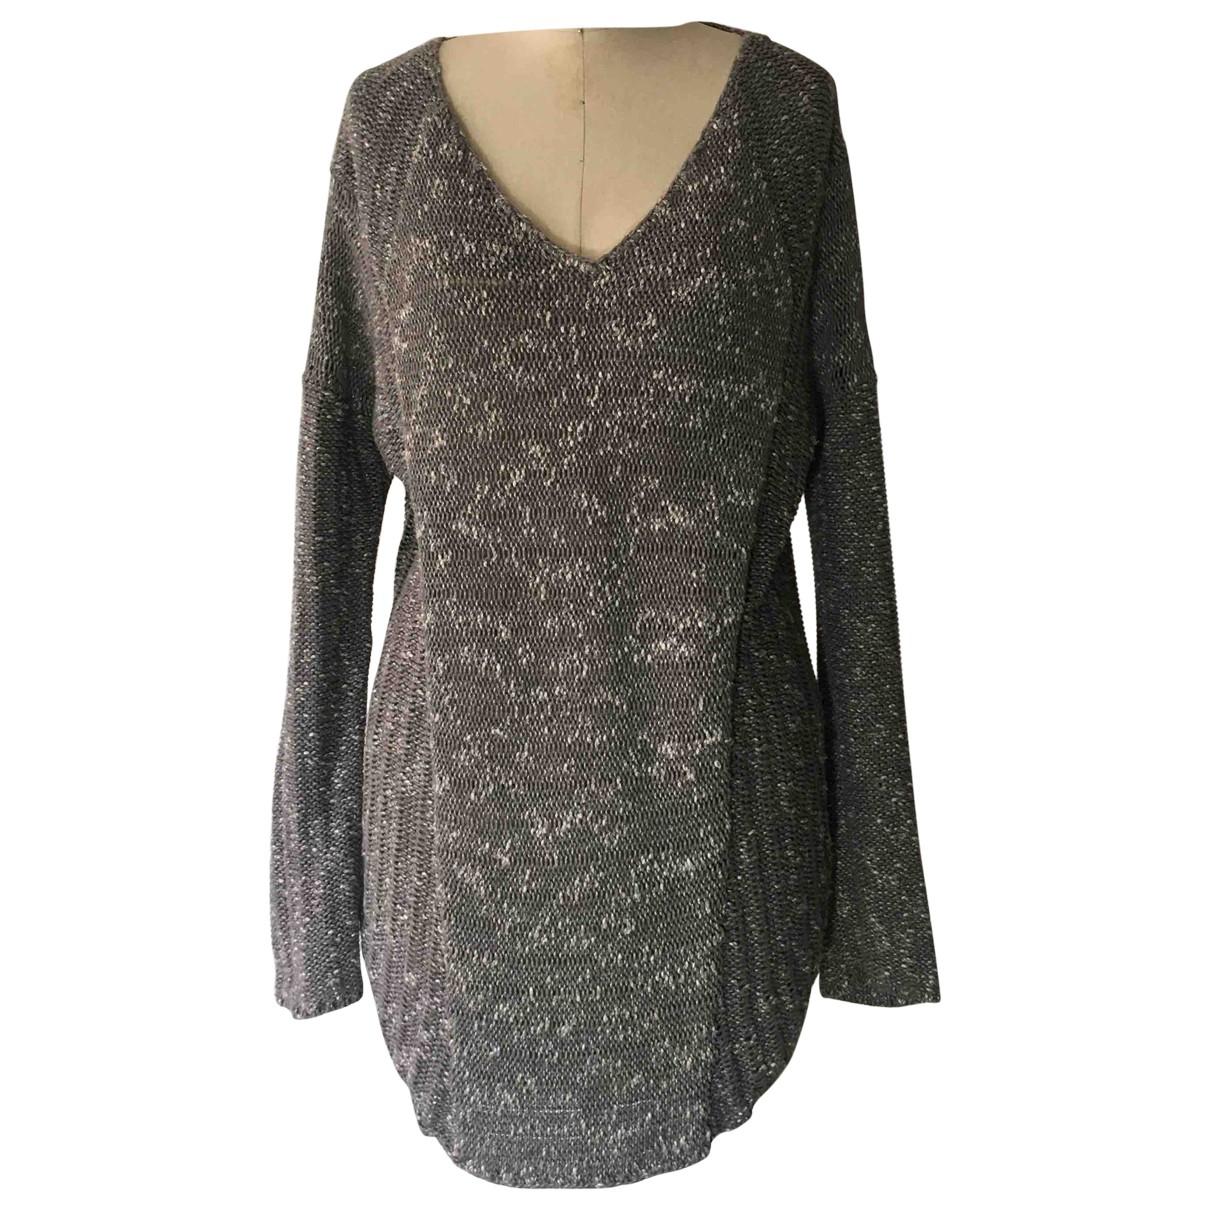 Helmut Lang \N Grey Cotton Knitwear for Women M International